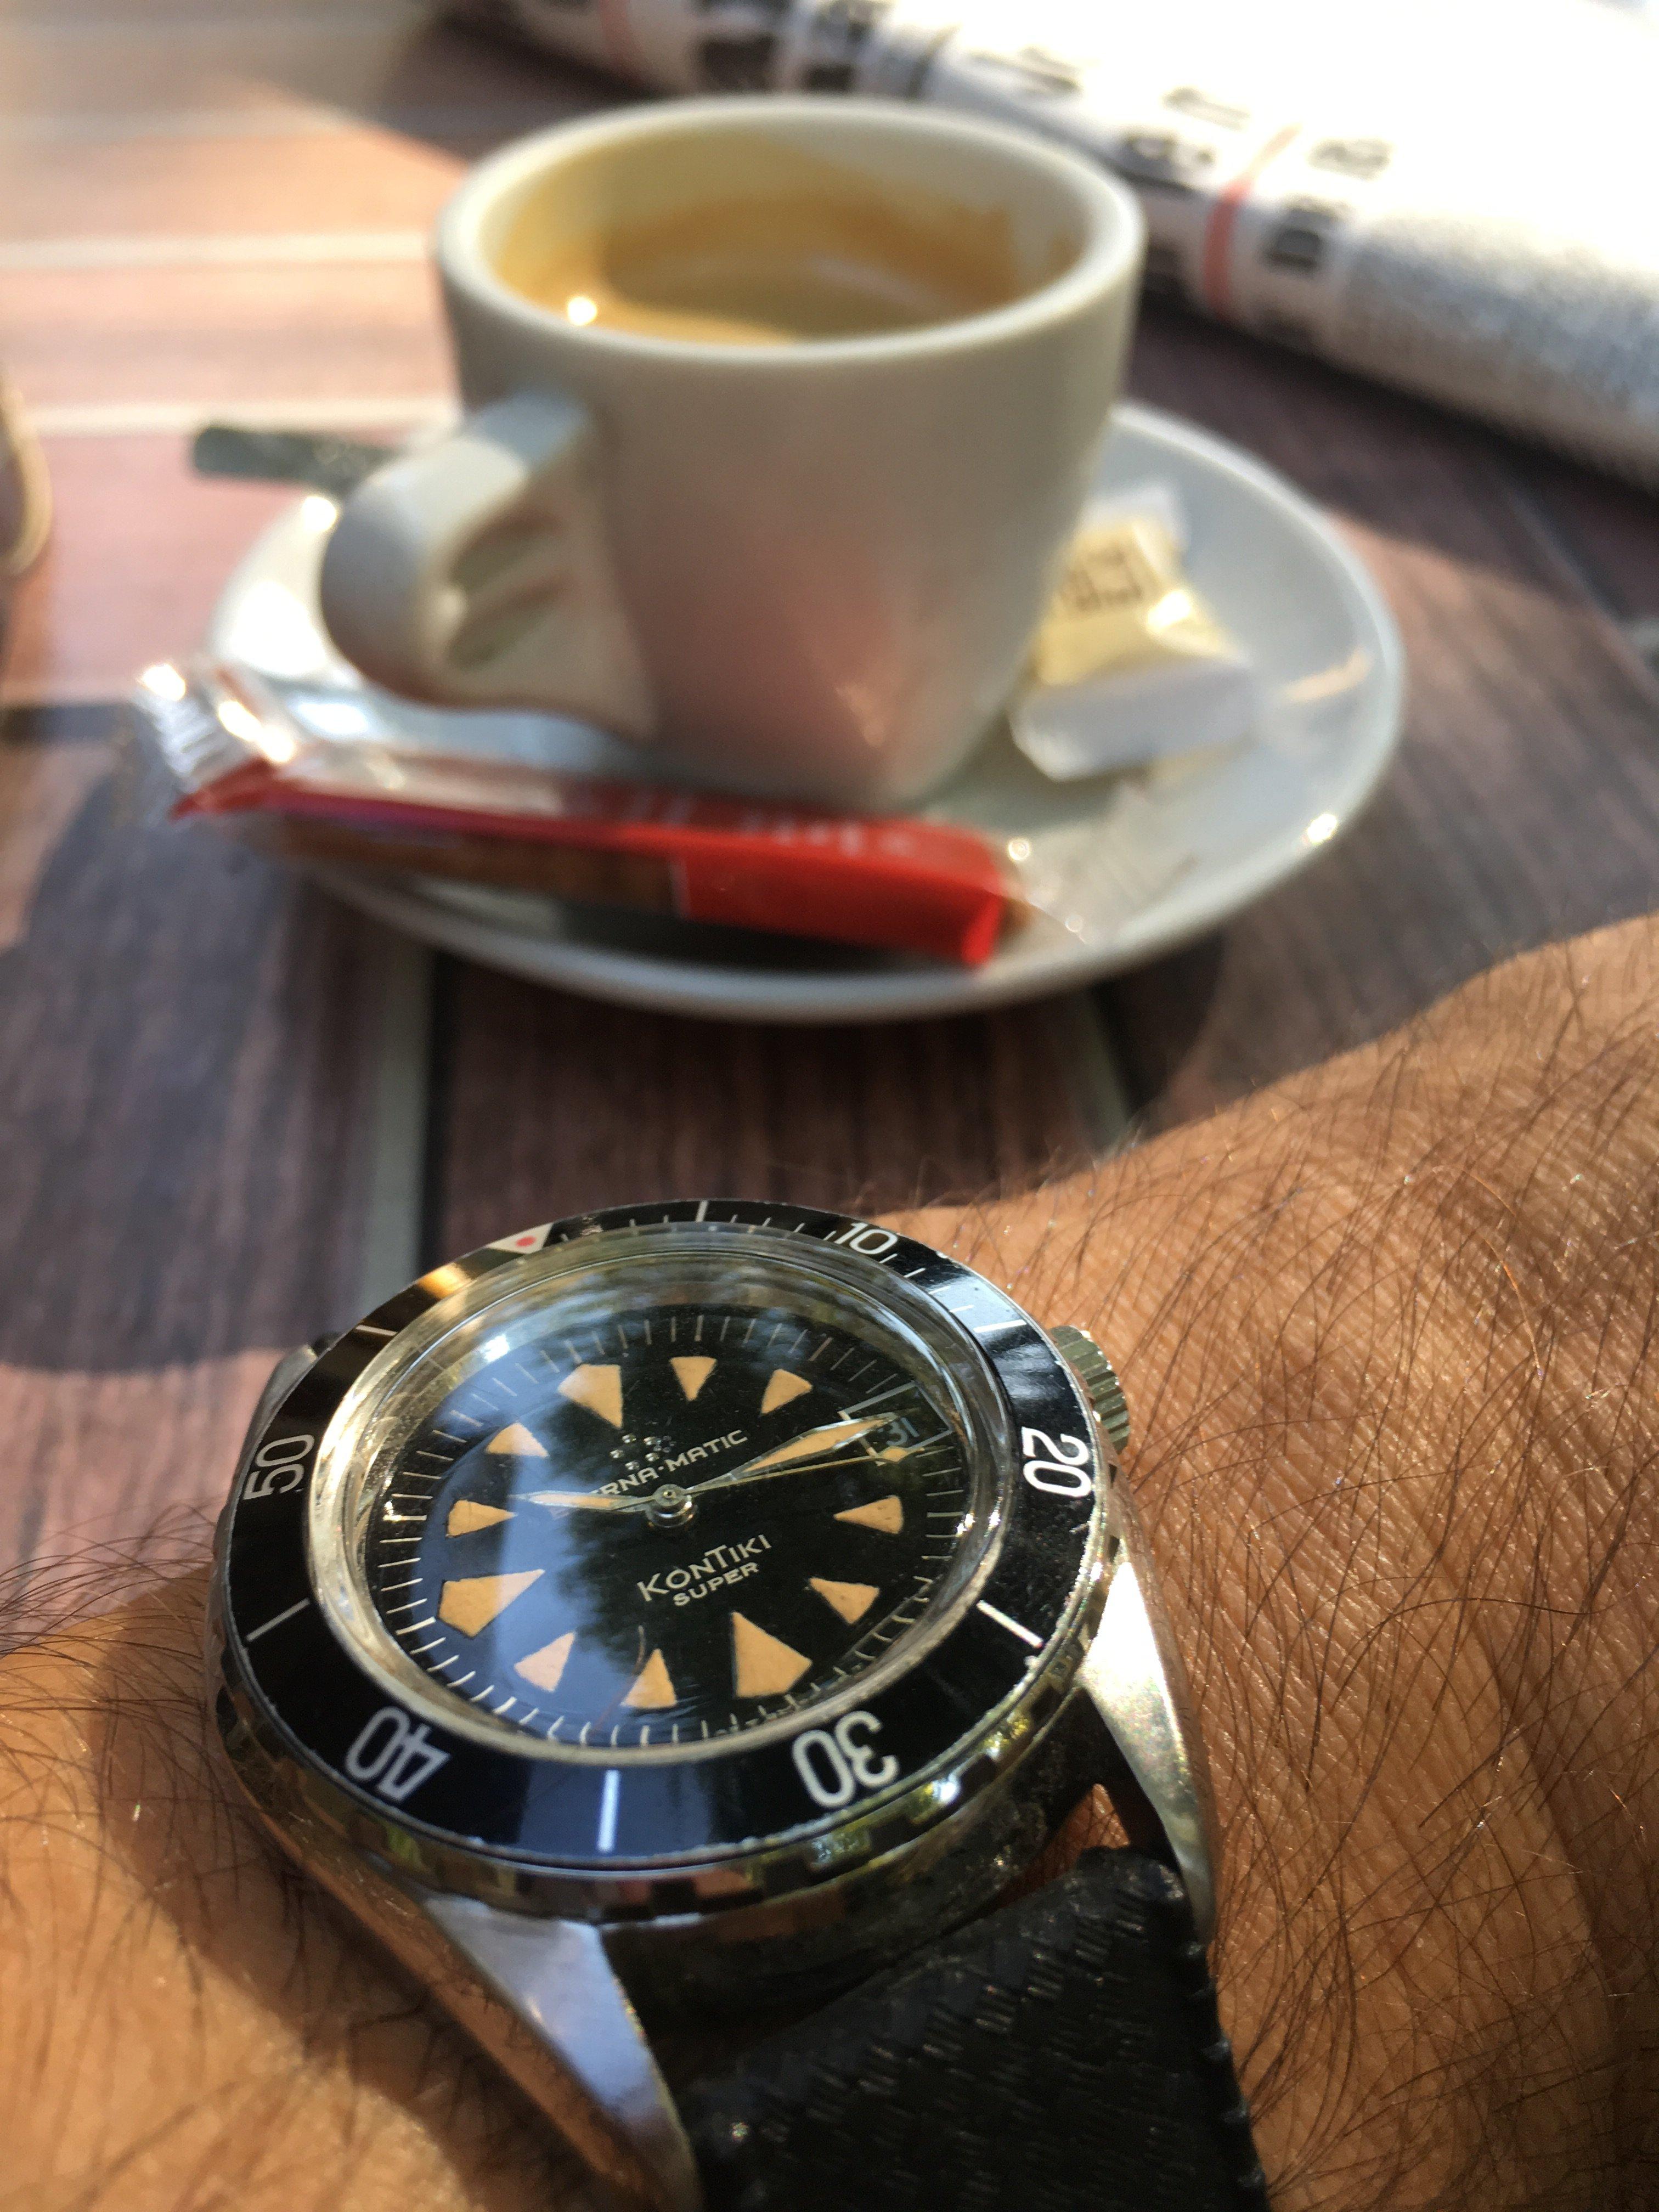 Pause café et montre (toutes marques) - tome III - Page 7 75950060-b776-4804-9452-b5a238eed165-jpeg